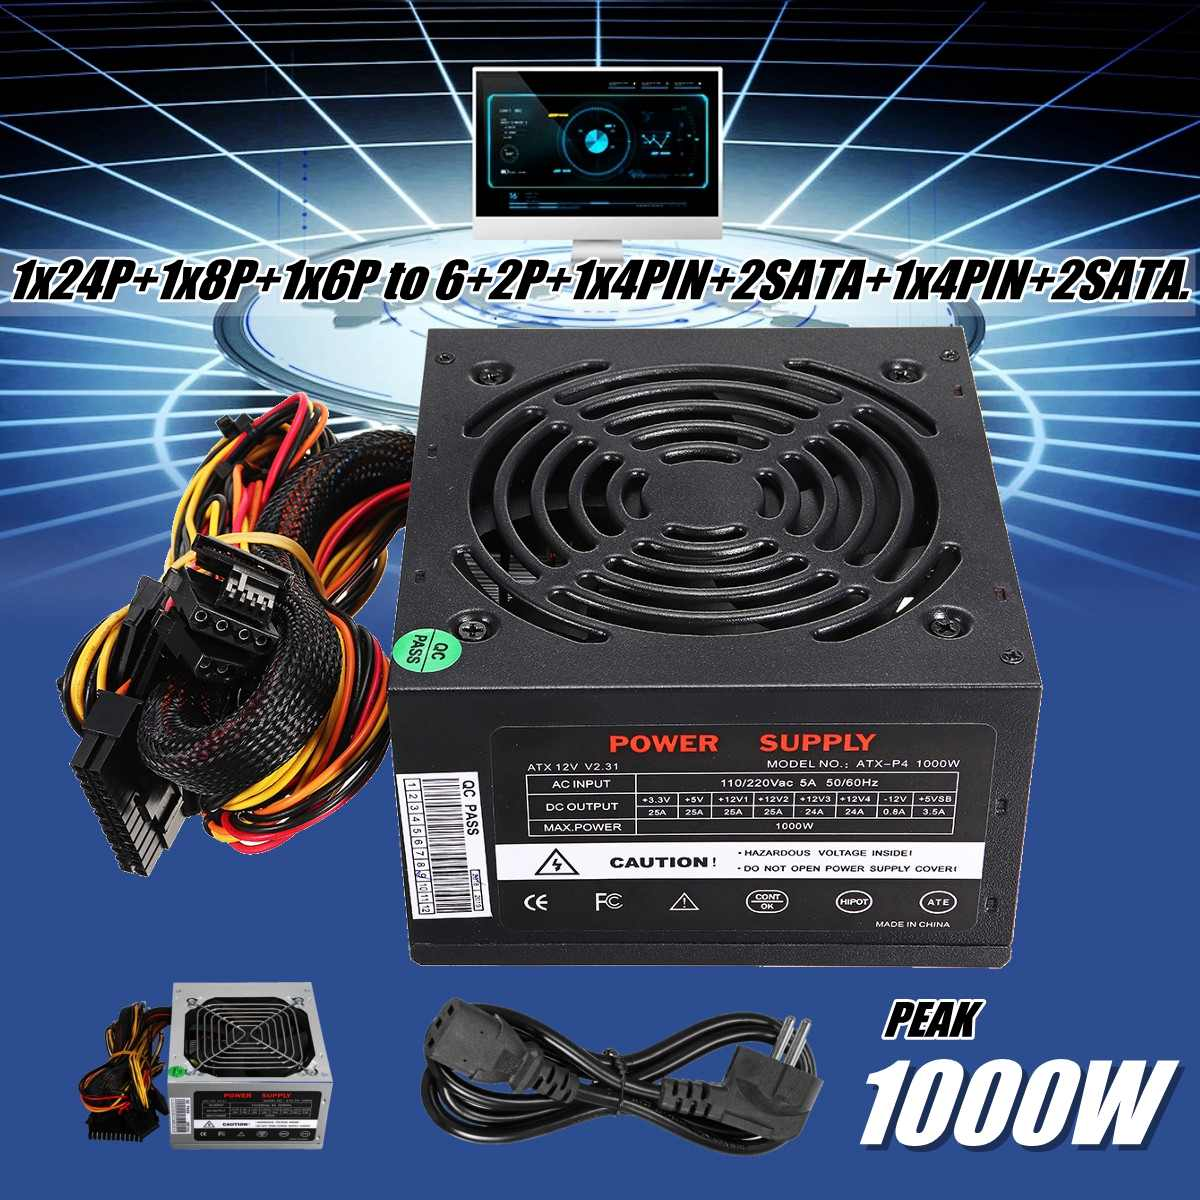 Max 1000W Power Supply PSU PFC Silent Fan ATX 24pin 12V PC Computer SATA Gaming PC Power Supply For Intel AMD Computer Black